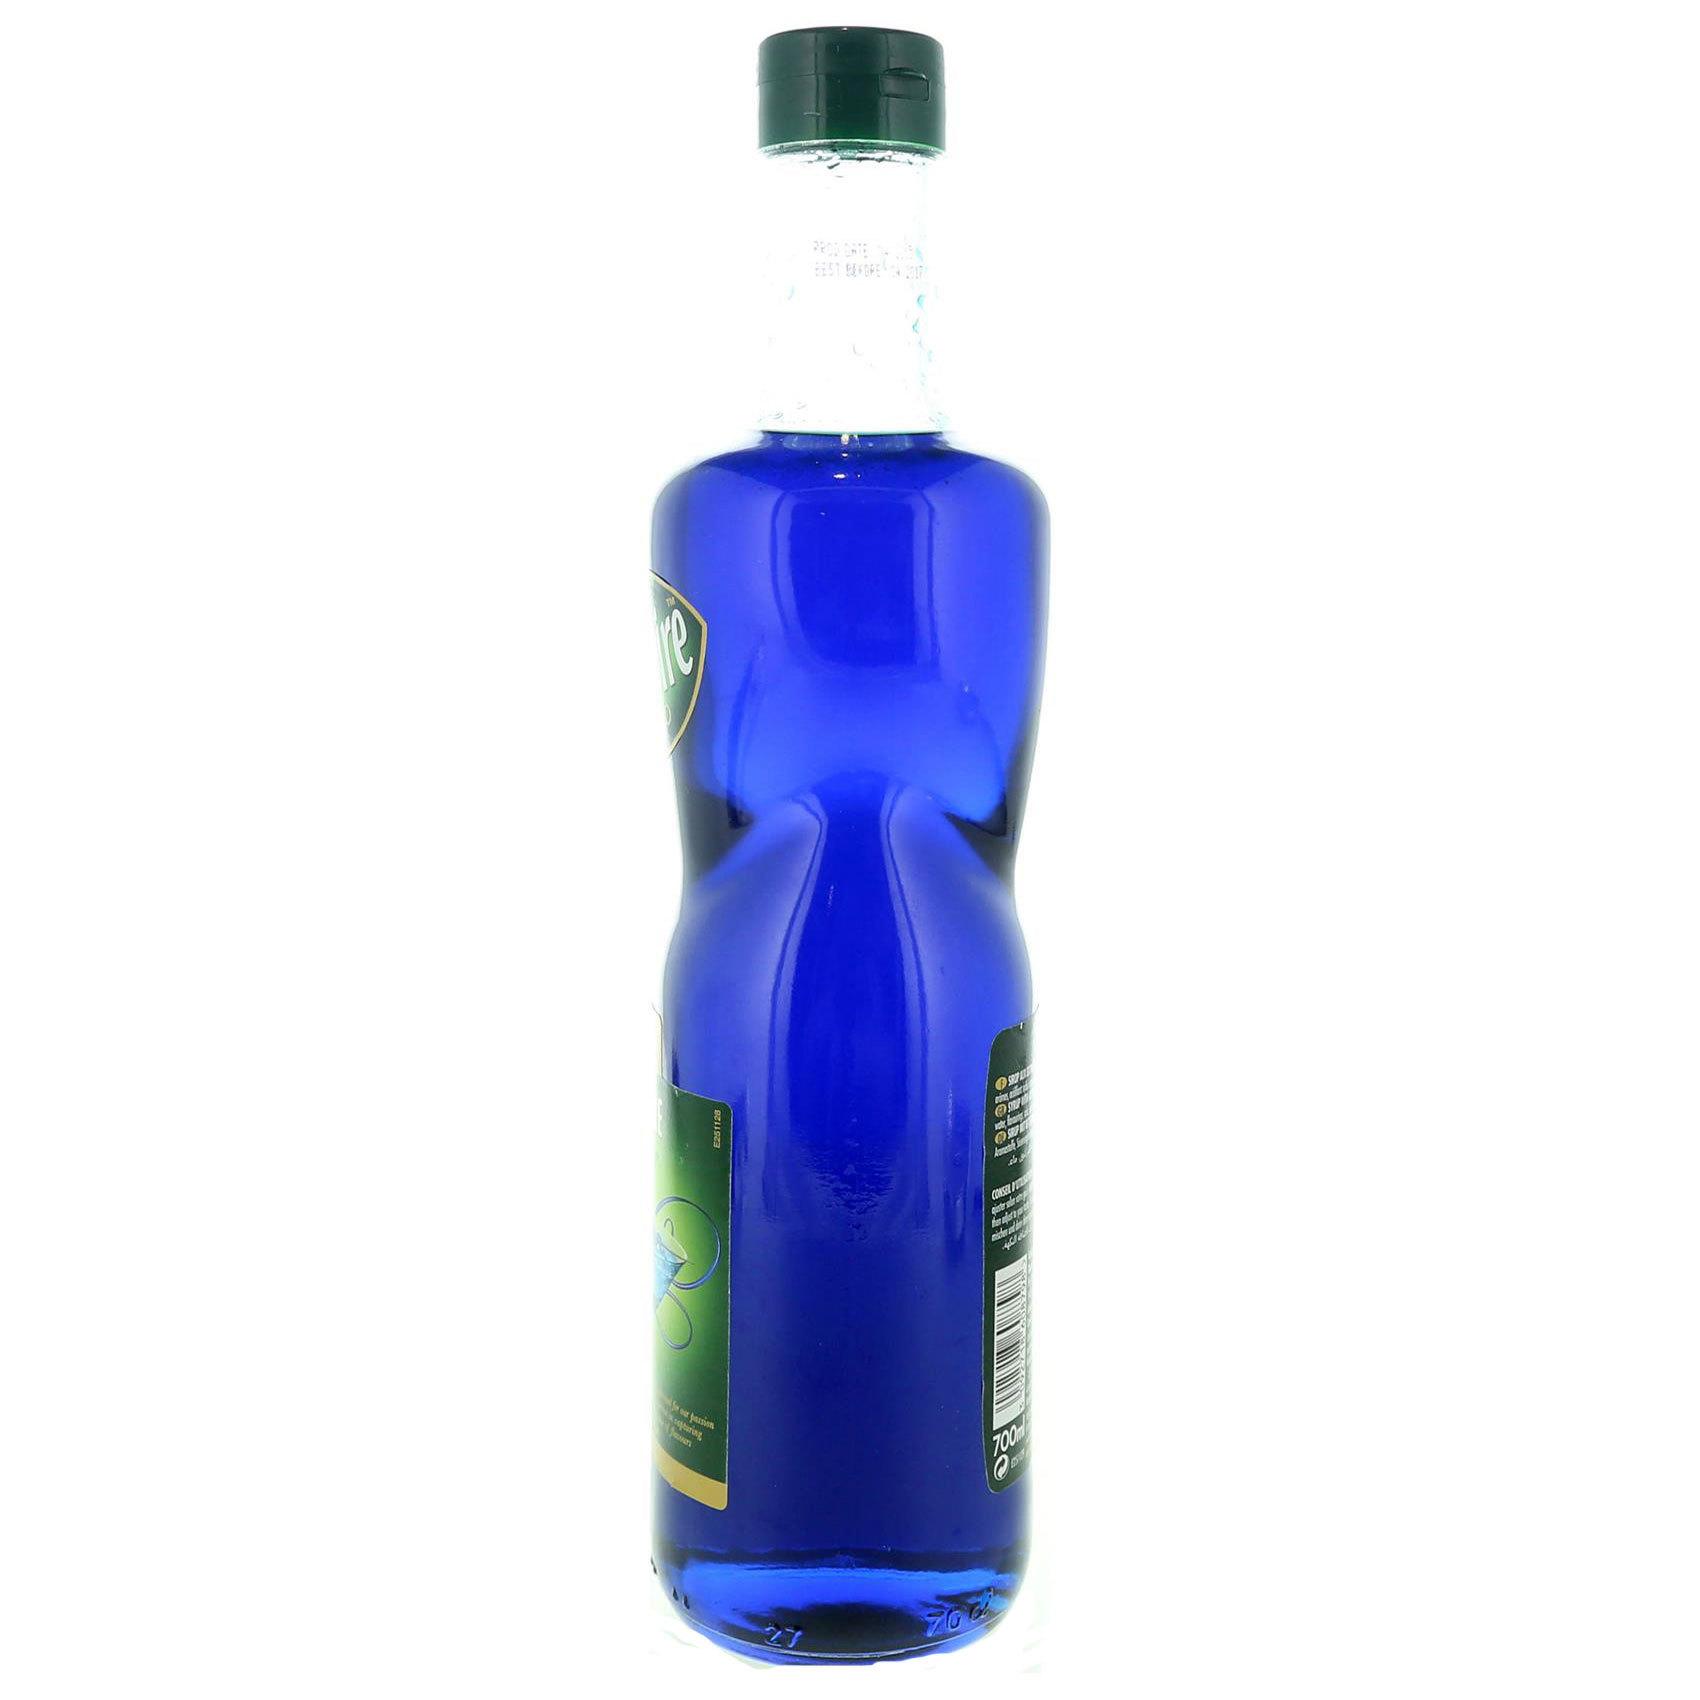 TEISSEIRE SYRUP BARMAN LA BLUE 70CL